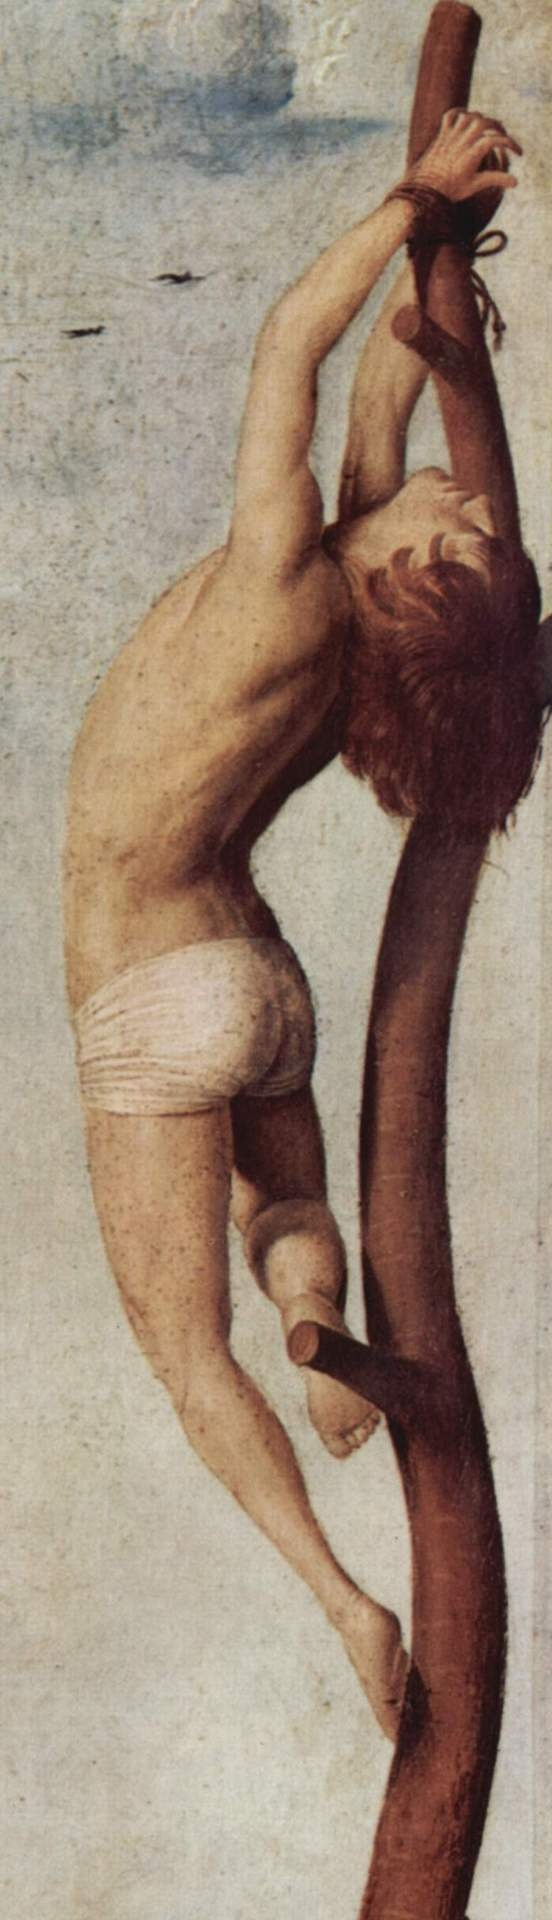 The Antwerp Crucifixion1454-1455Antonello da Messina